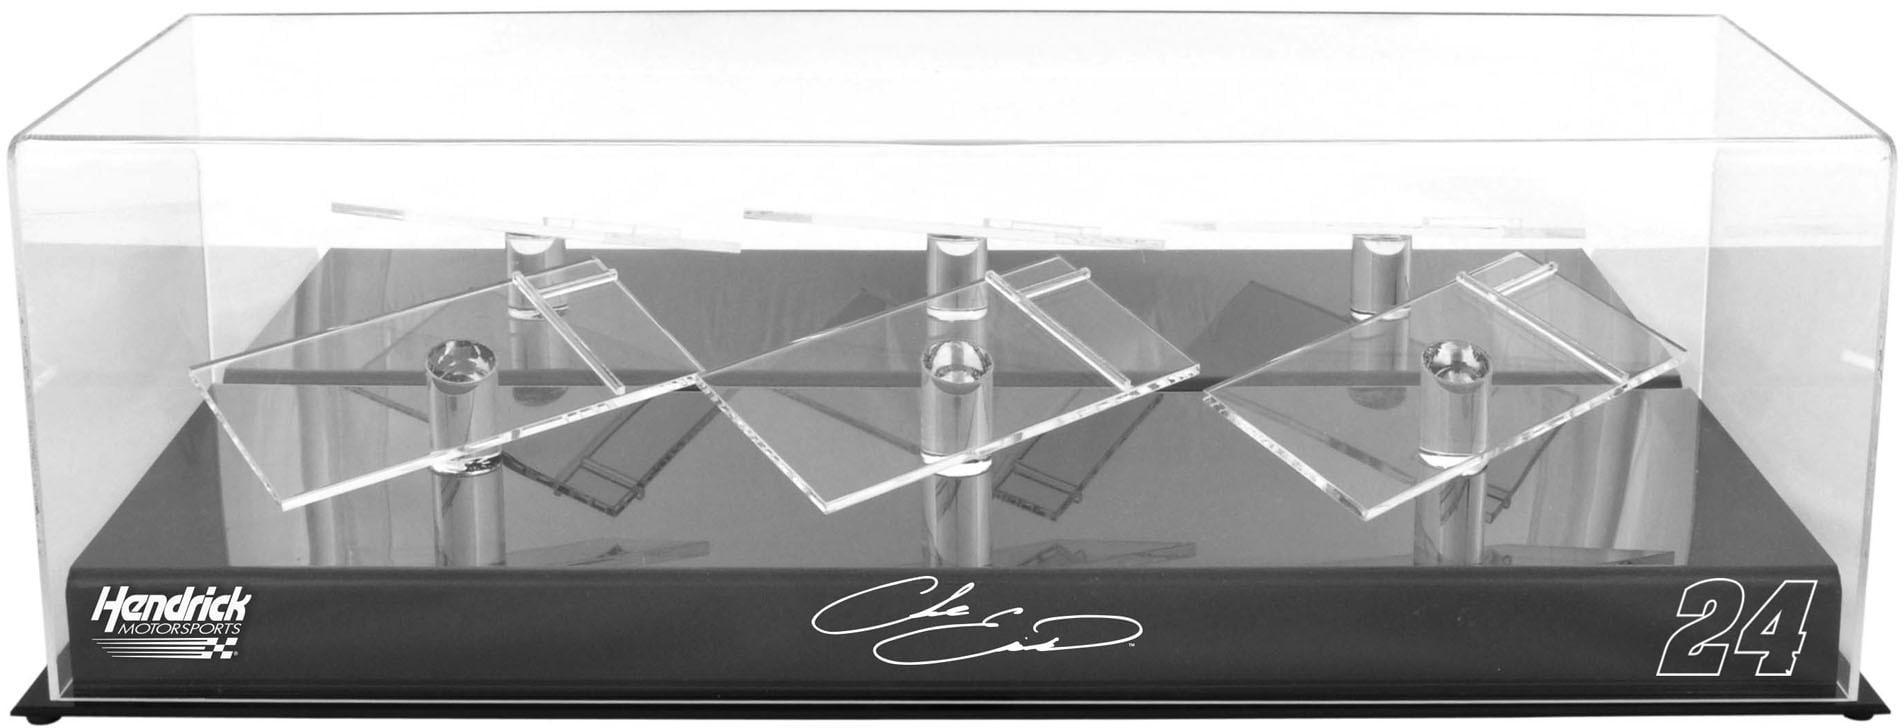 Chase Elliott #24 Hendrick Motorsports 3 Car 1 24 Scale Die Cast Display Case With Platforms Fanatics... by Fanatics Authentic